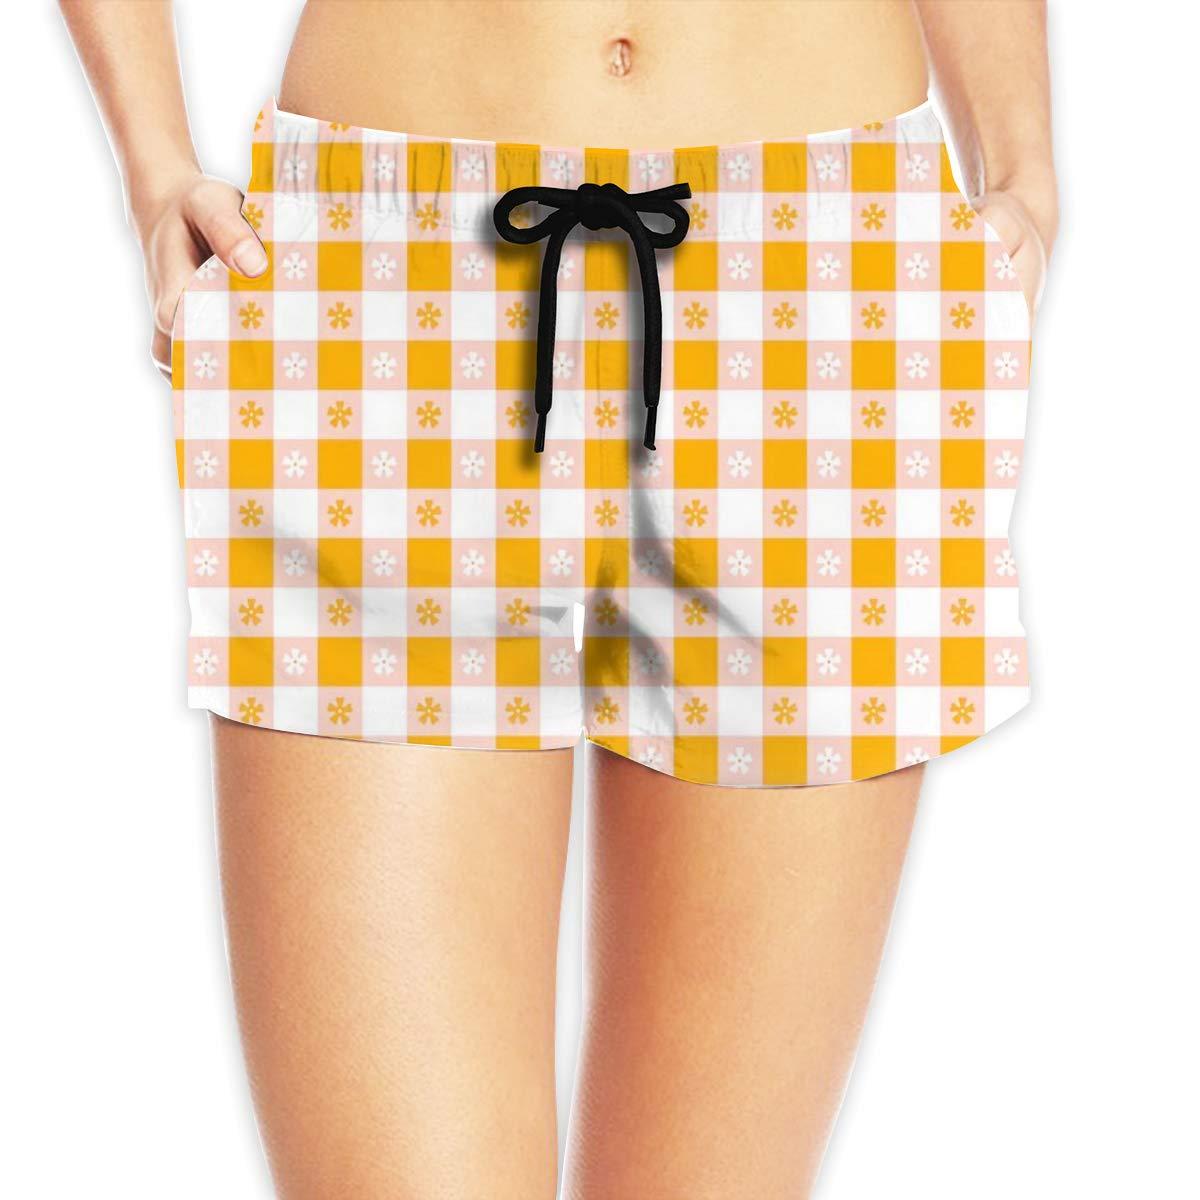 Women Comfortable Hawaii Waves Travel Vintage Beach Shorts Swim Trunks Board Shorts